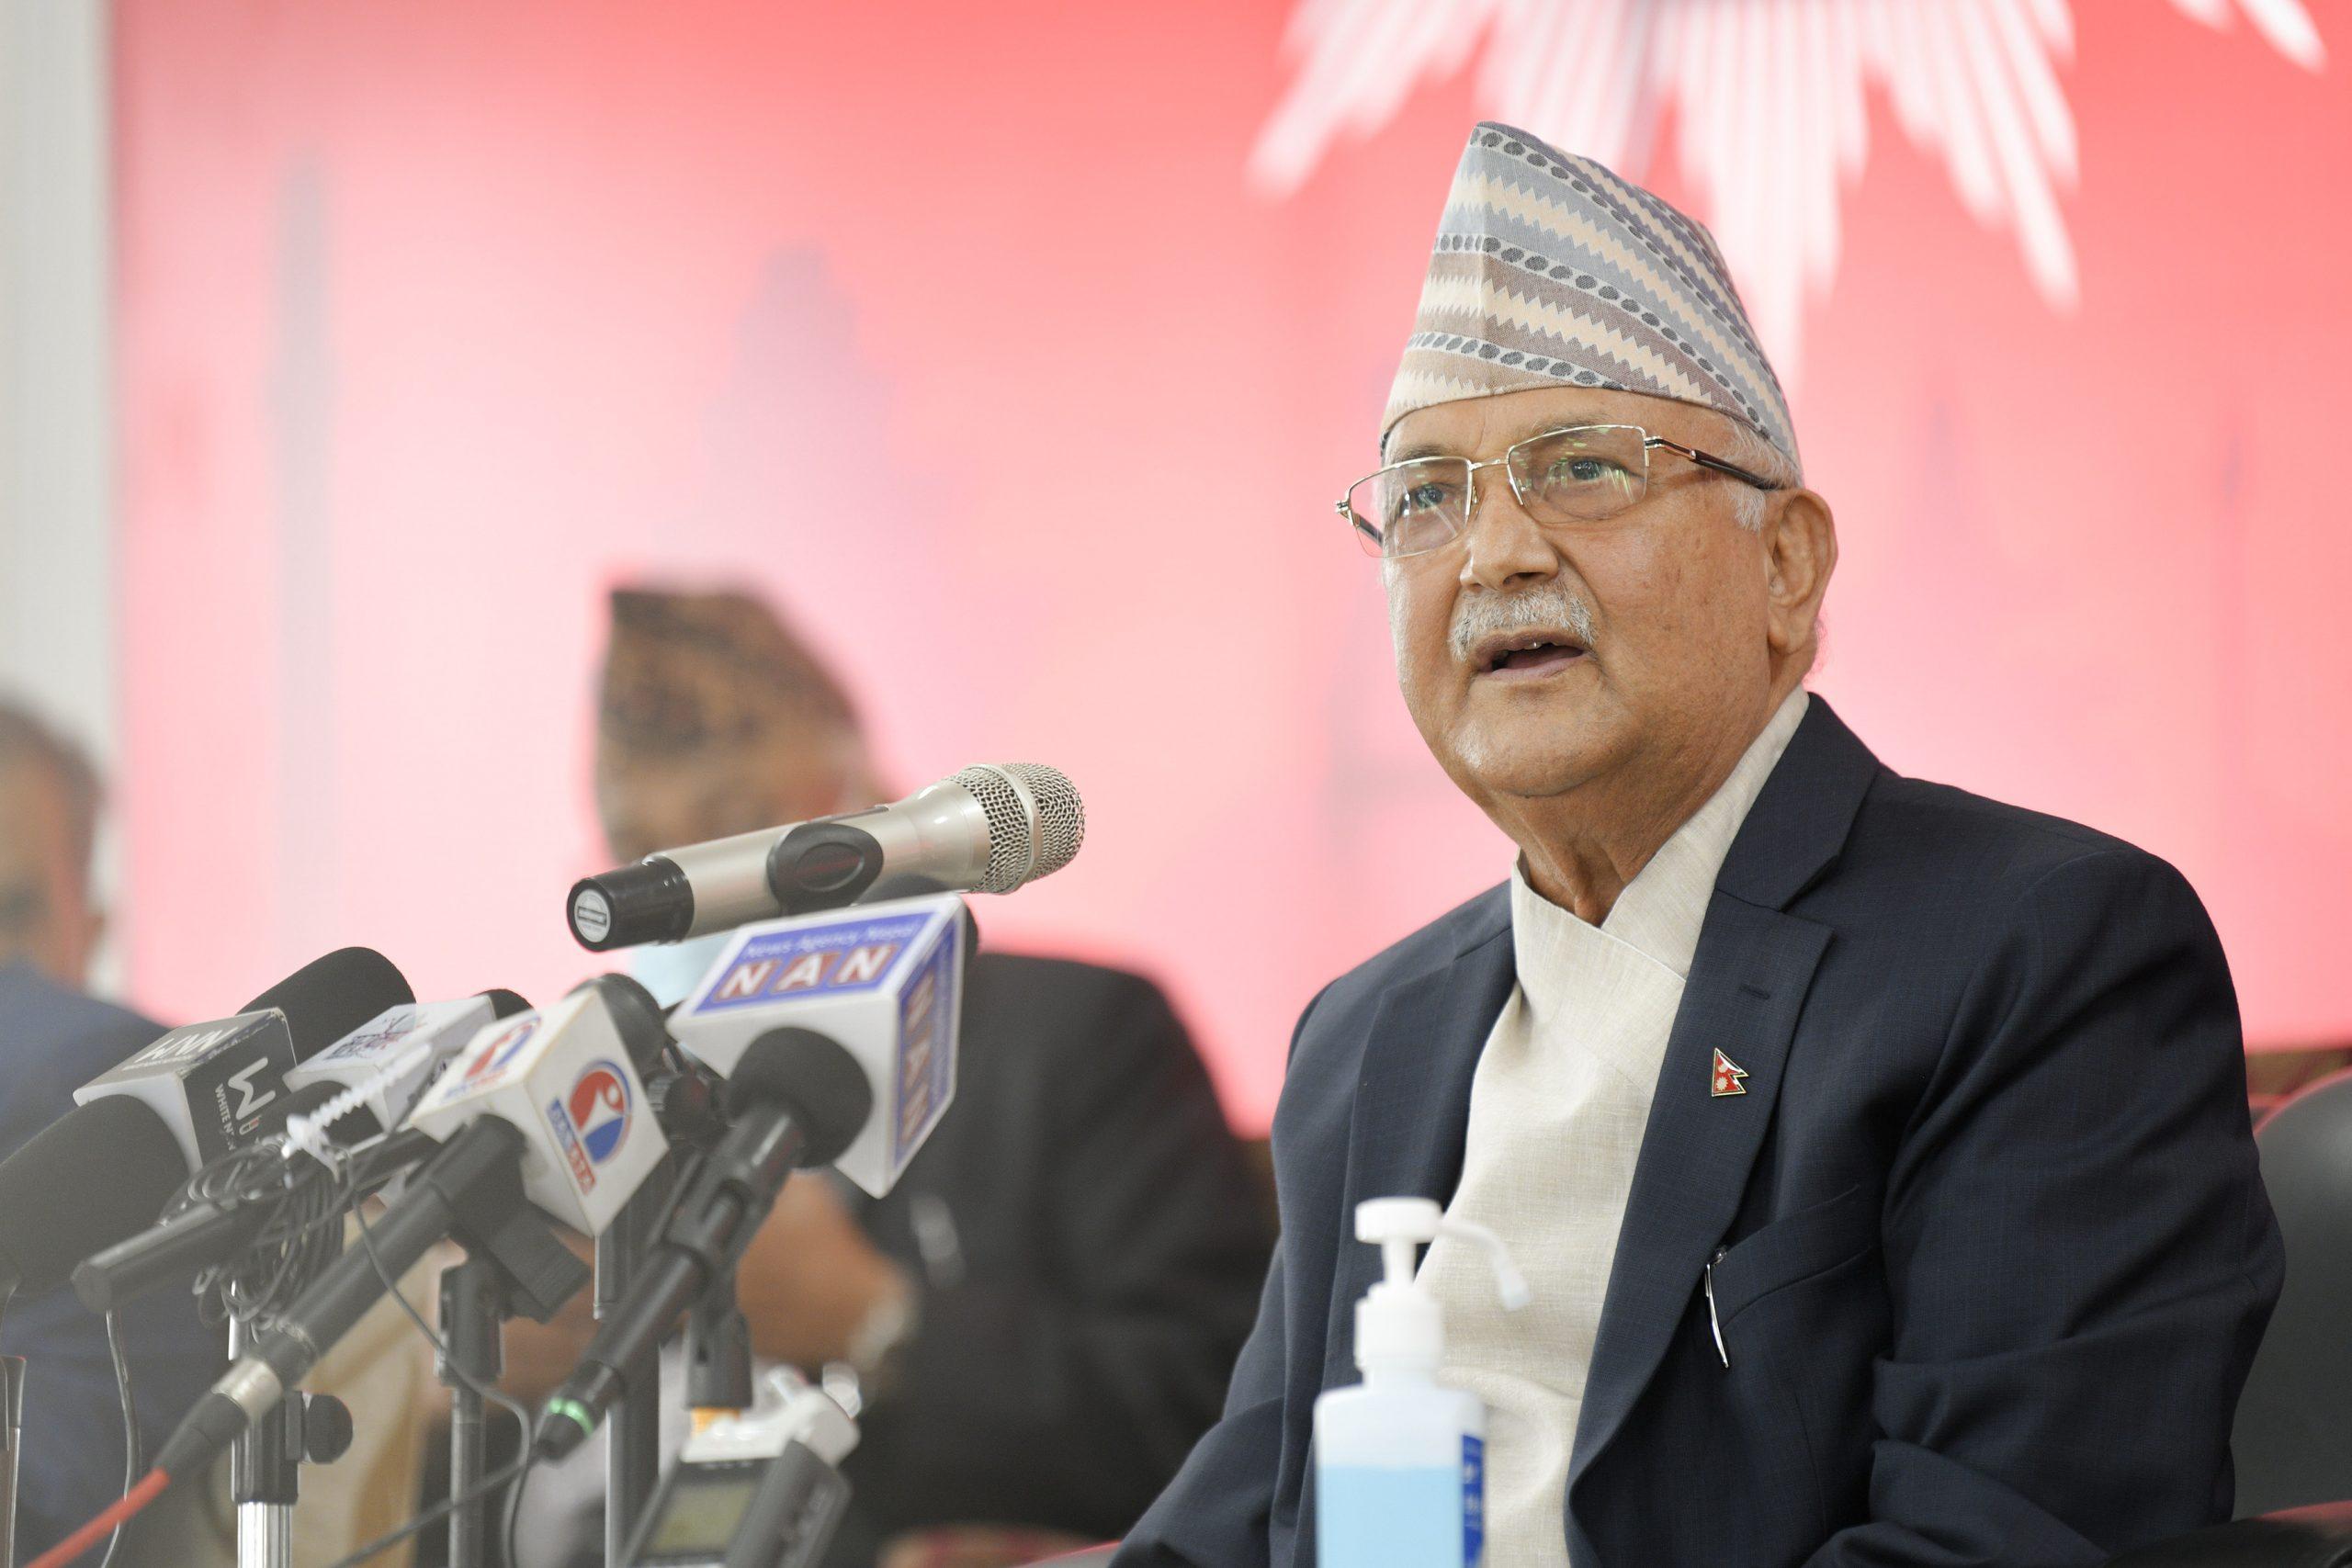 माधव नेपाल पक्षलाई आममाफी दिने ओलीको घोषणा